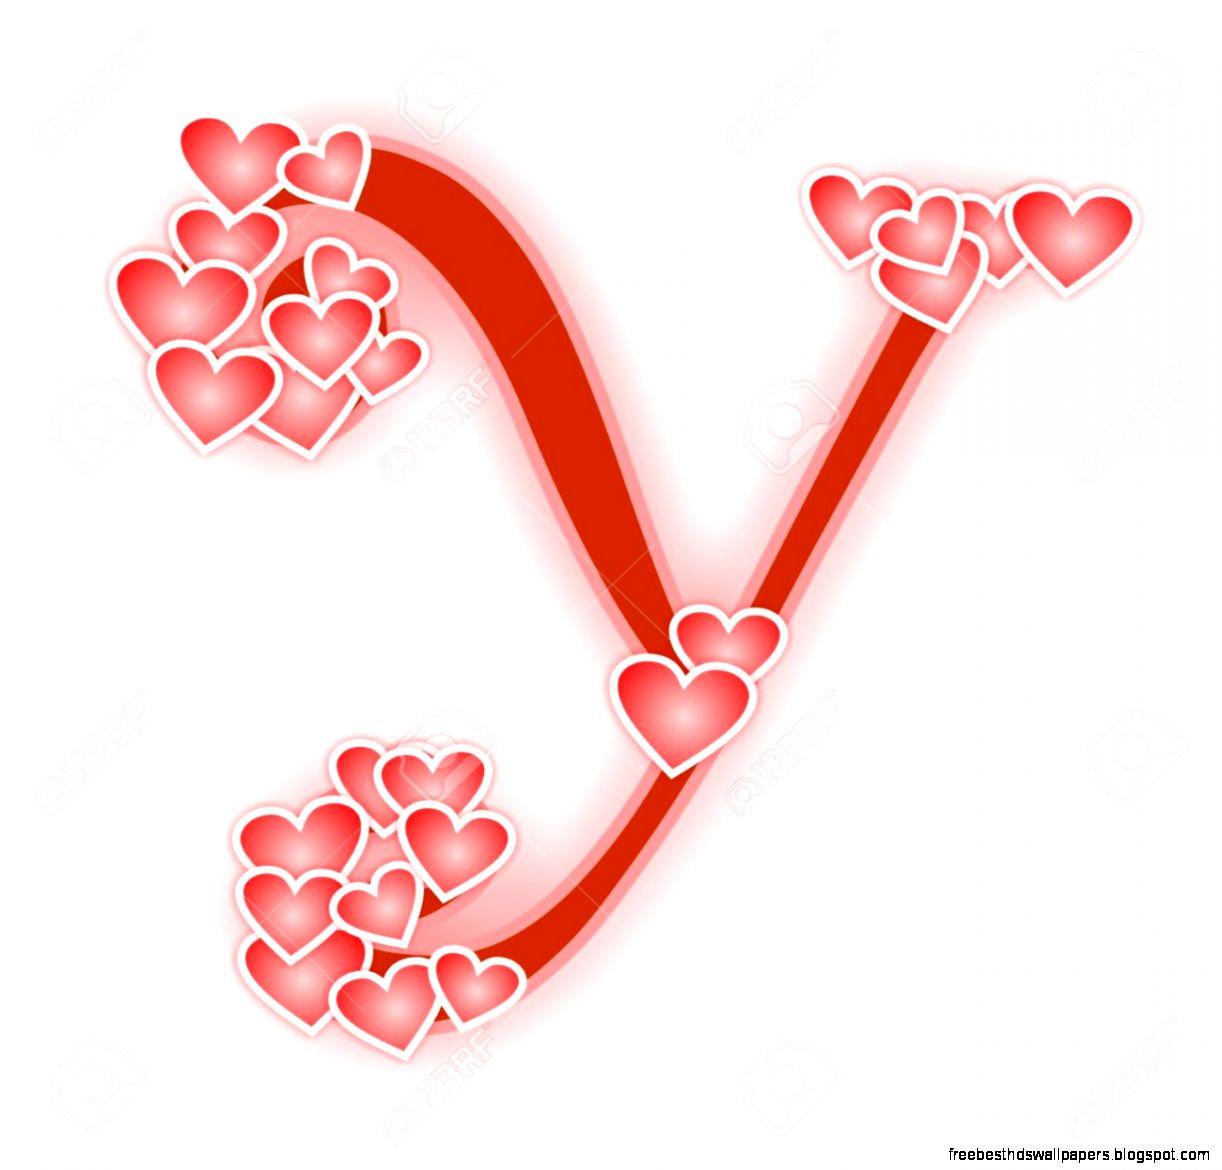 Y love free best hd wallpapers view original size altavistaventures Choice Image